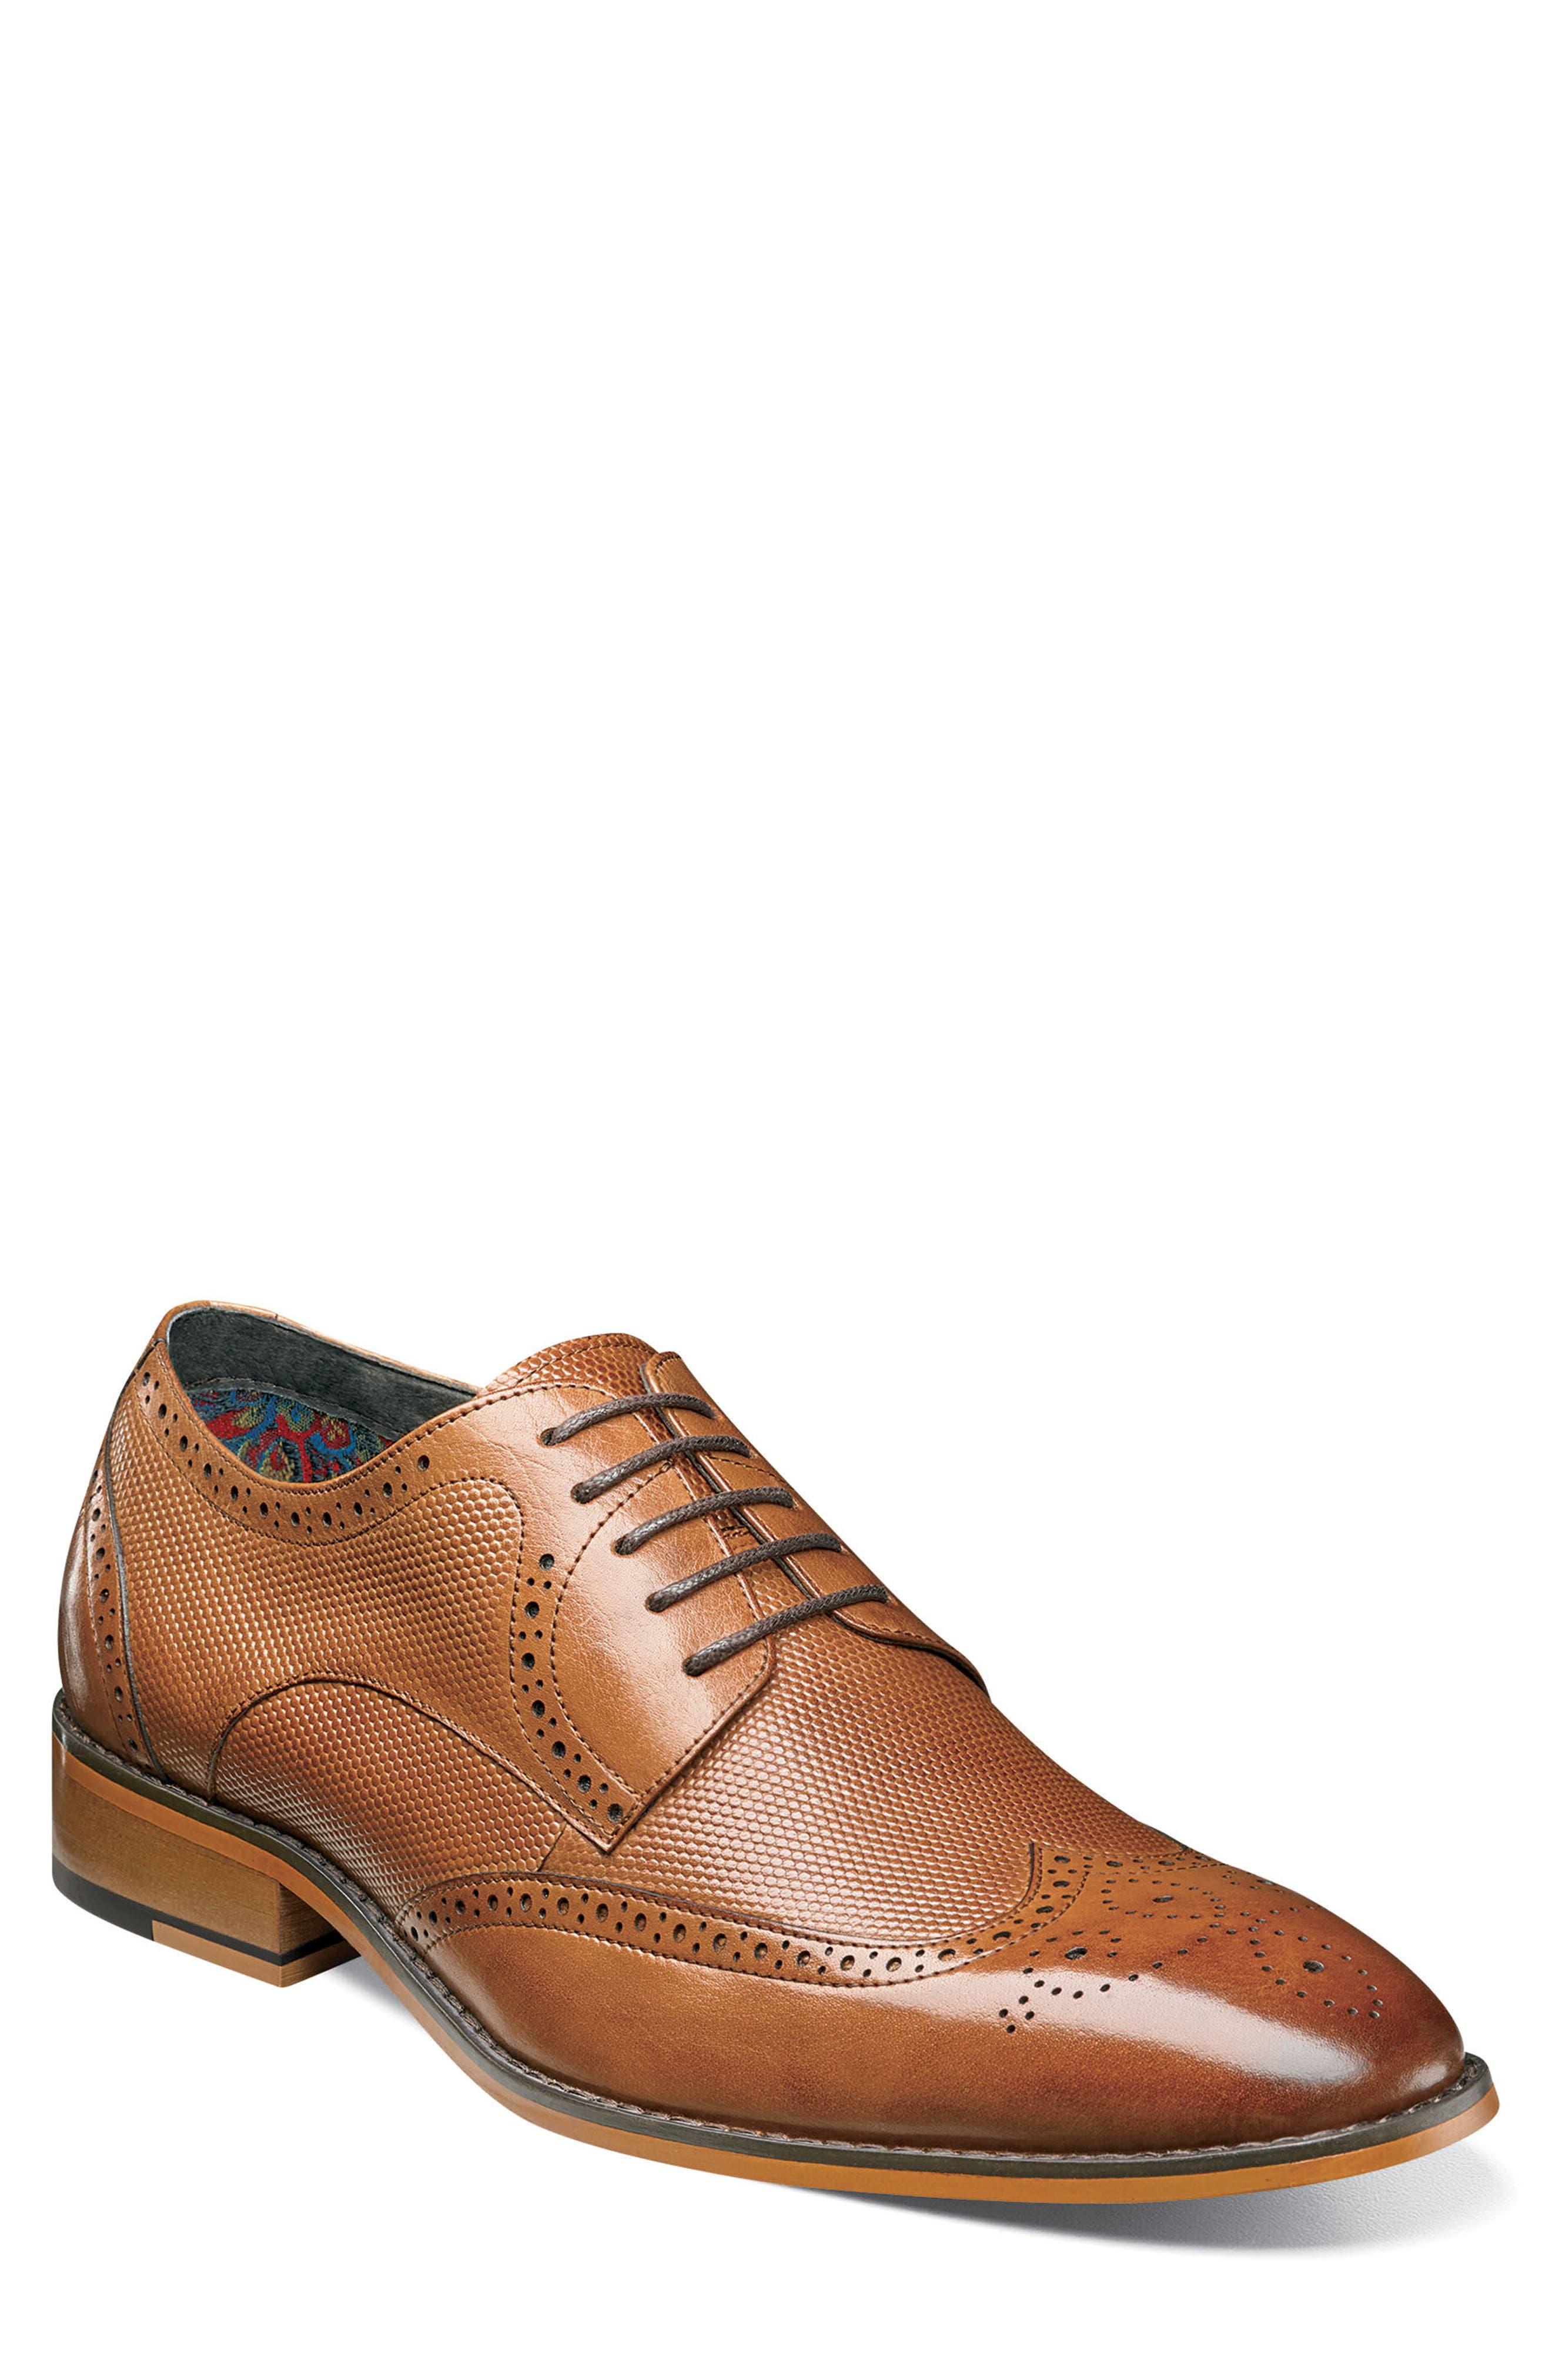 Lindell Wingtip,                             Main thumbnail 1, color,                             Saddle Tan Leather